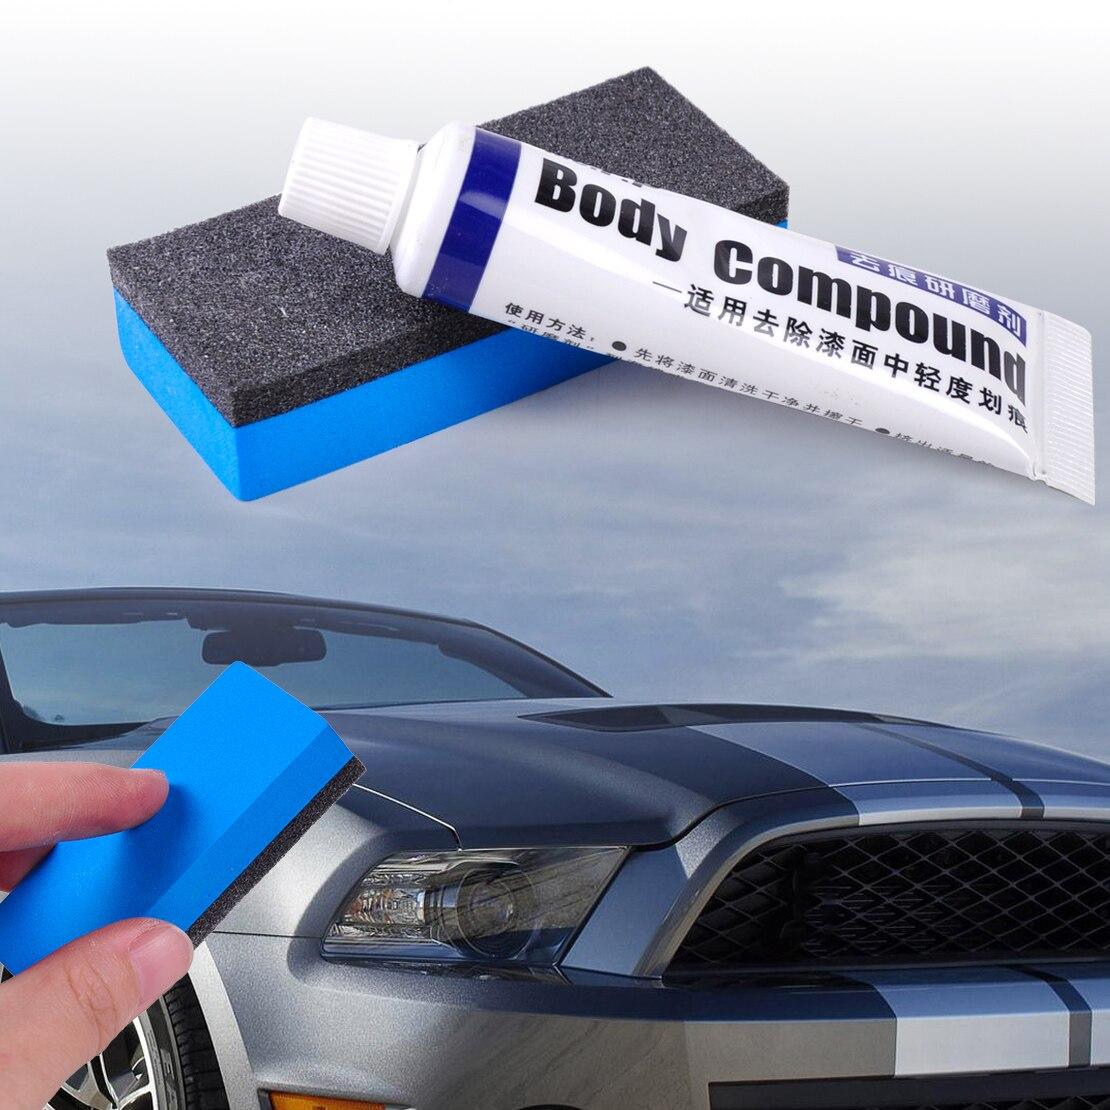 Car Wash & Maintenance Dwcx Car Scratch Assistance Remover Useful Vehicle Body Paint Care Body Polishing Gringding Compound Paste With Sponge